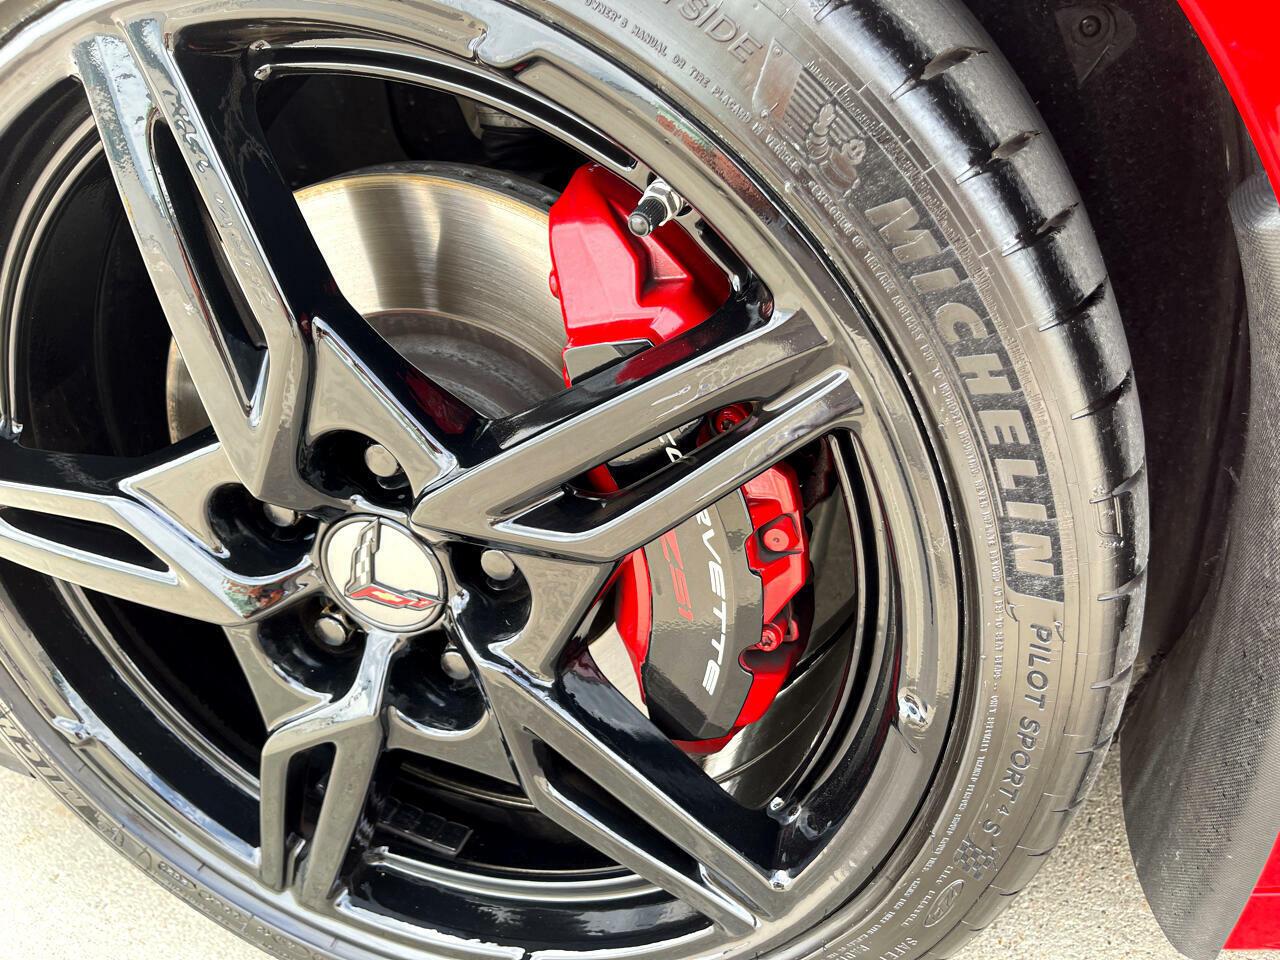 2020 Red Chevrolet Corvette Coupe 1LT | C7 Corvette Photo 9